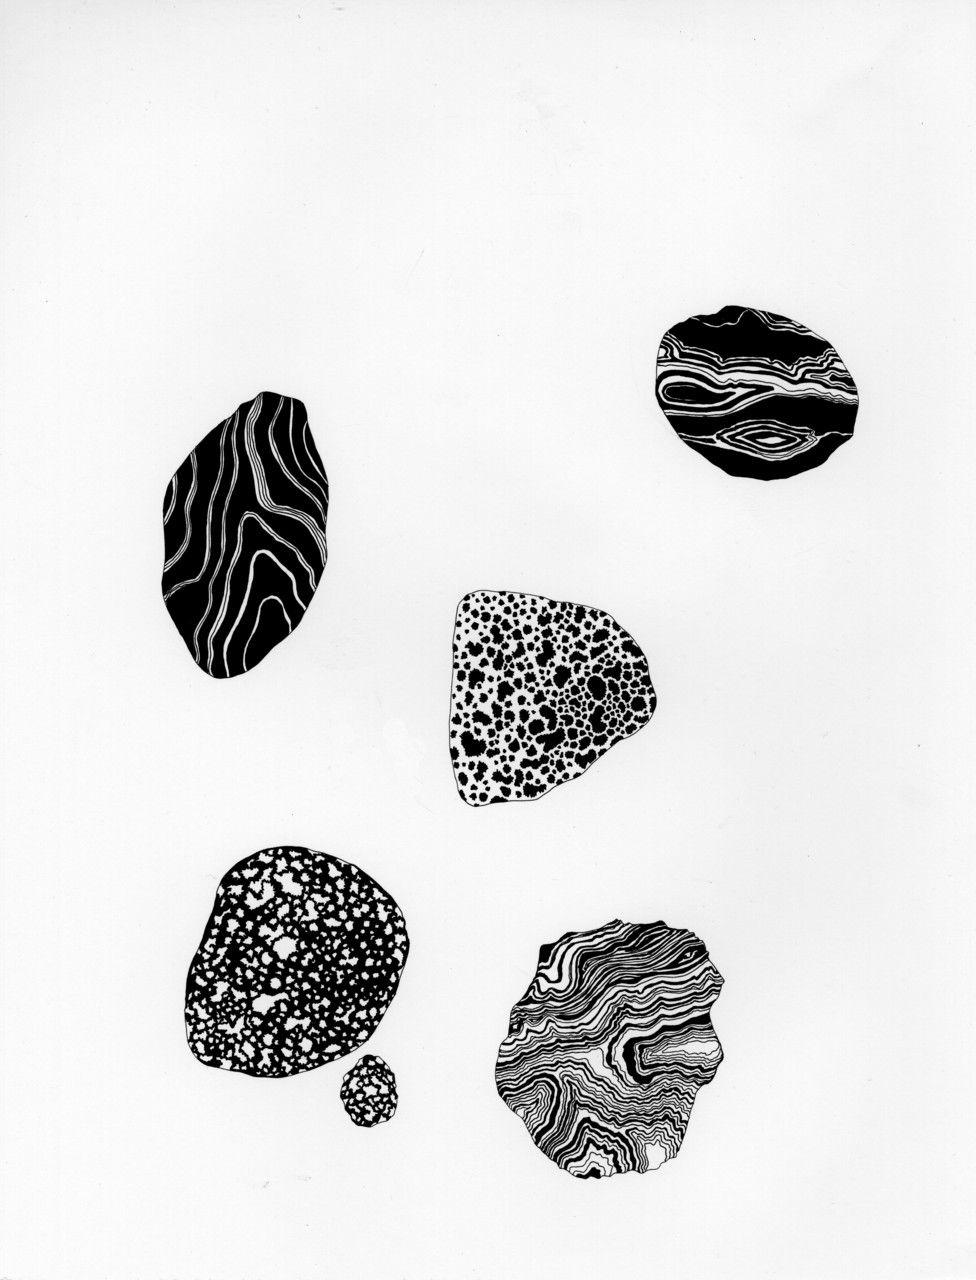 oieouio: Stones, 2010